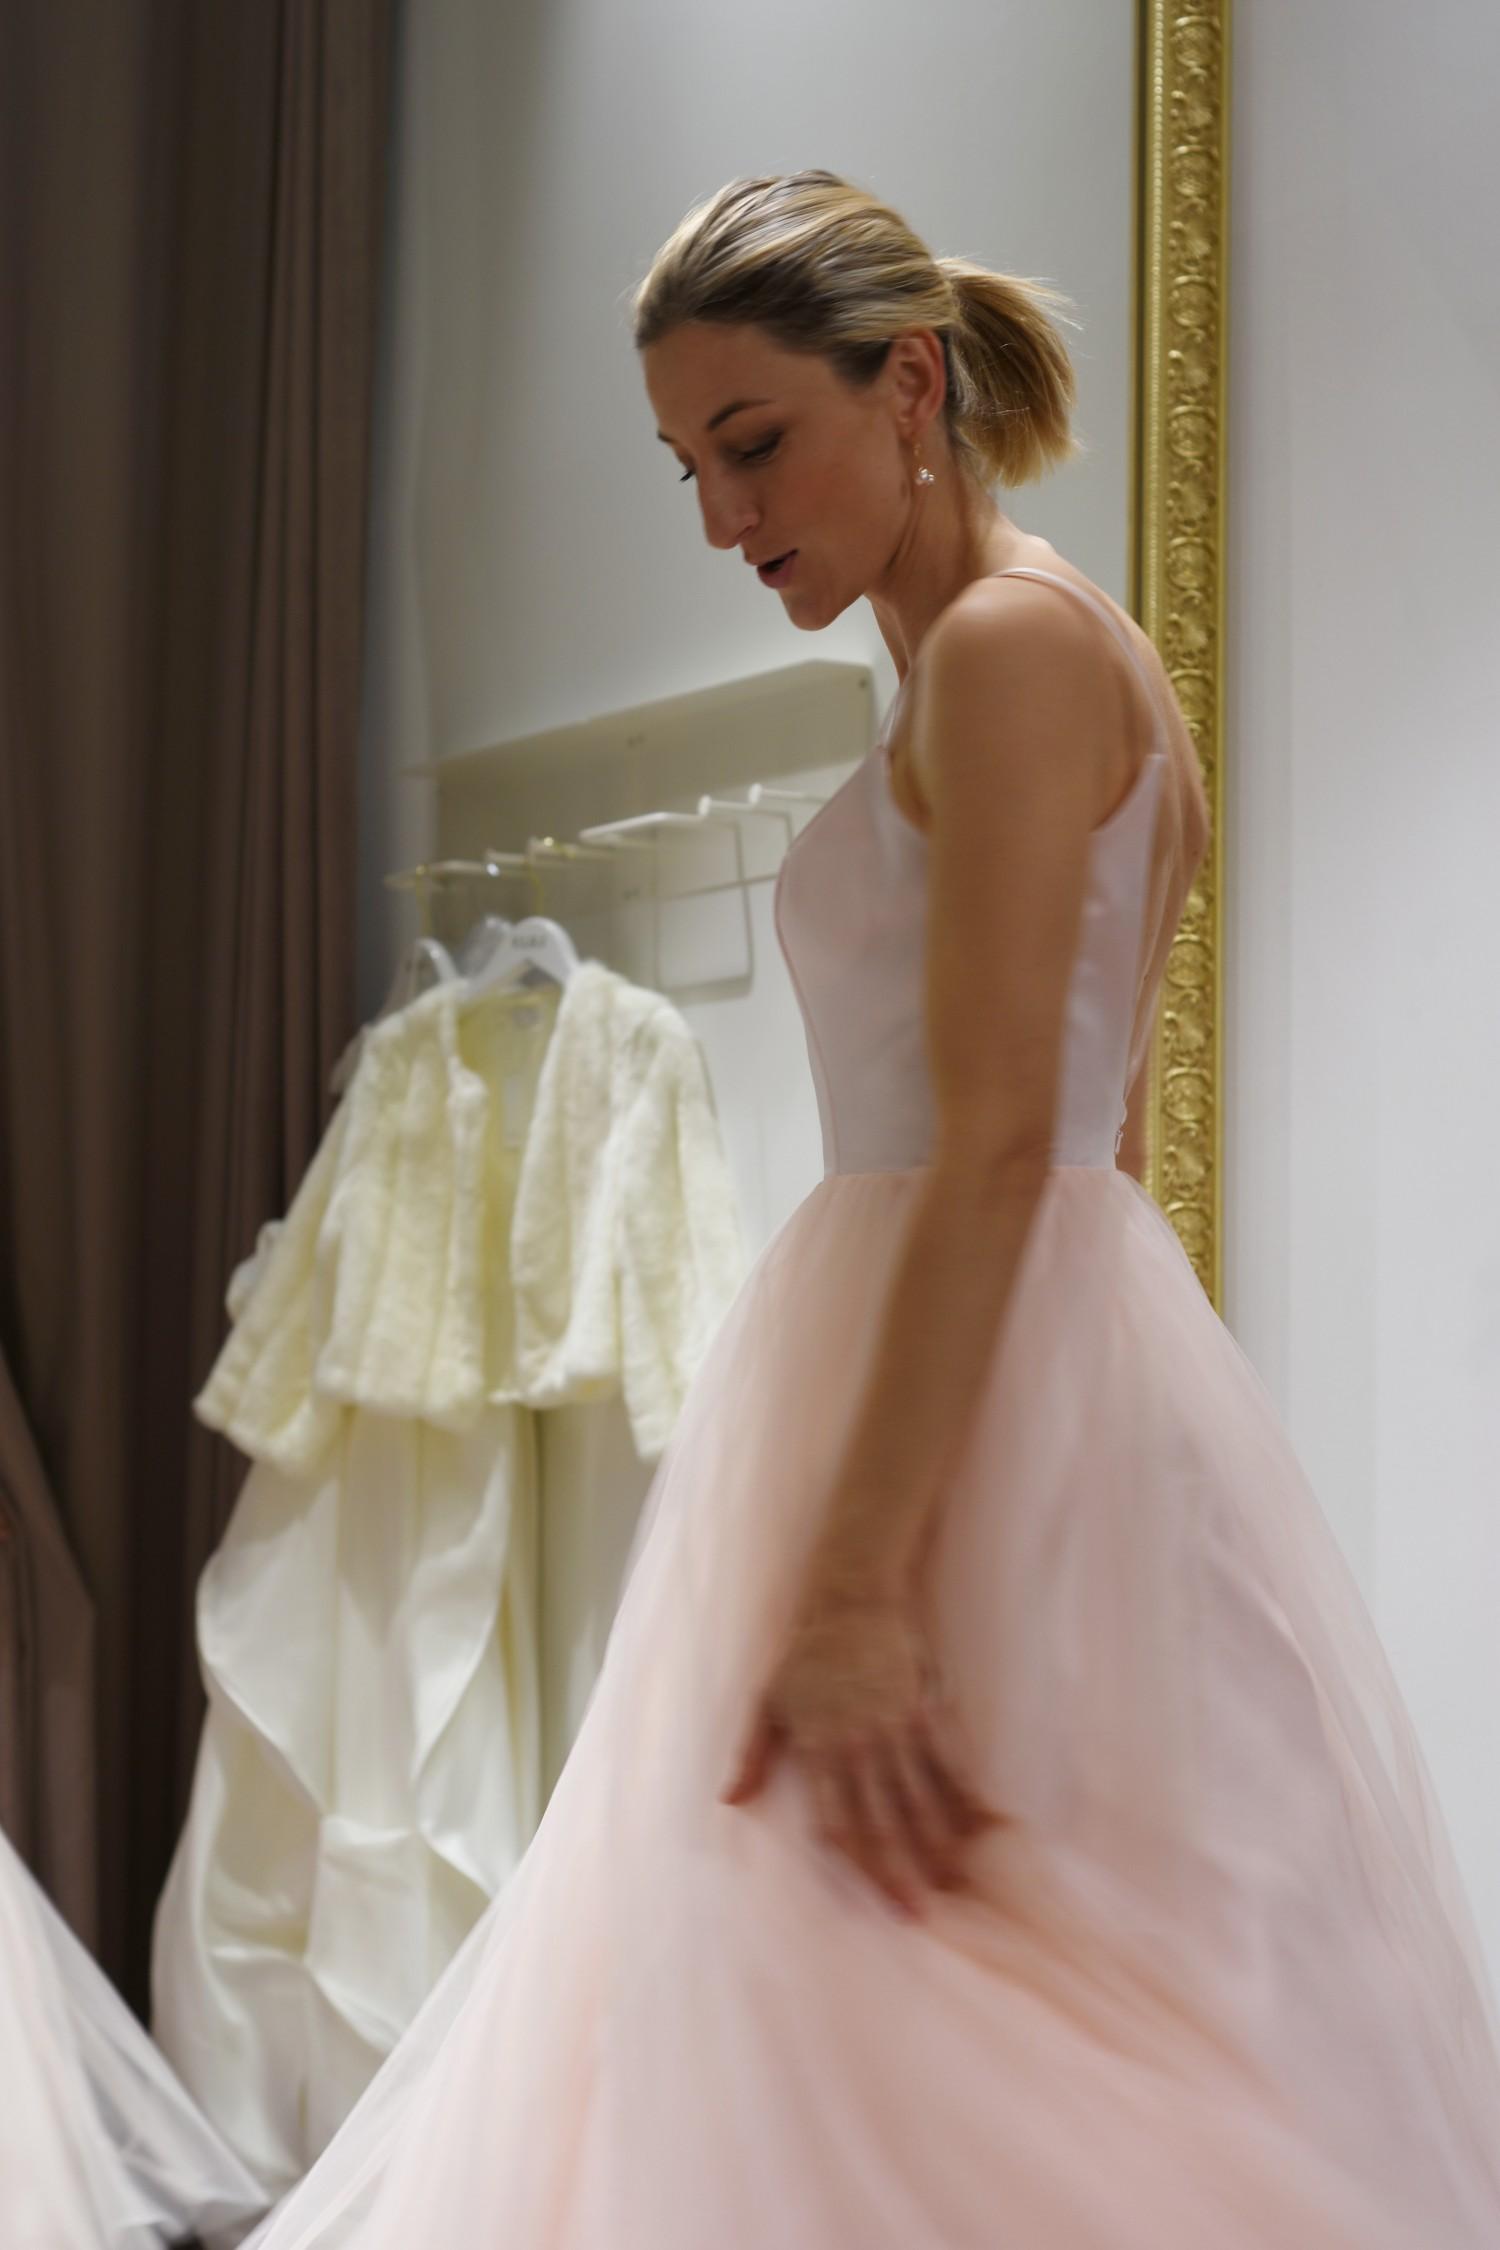 lilly-brudekjoler-annemette-voss-53